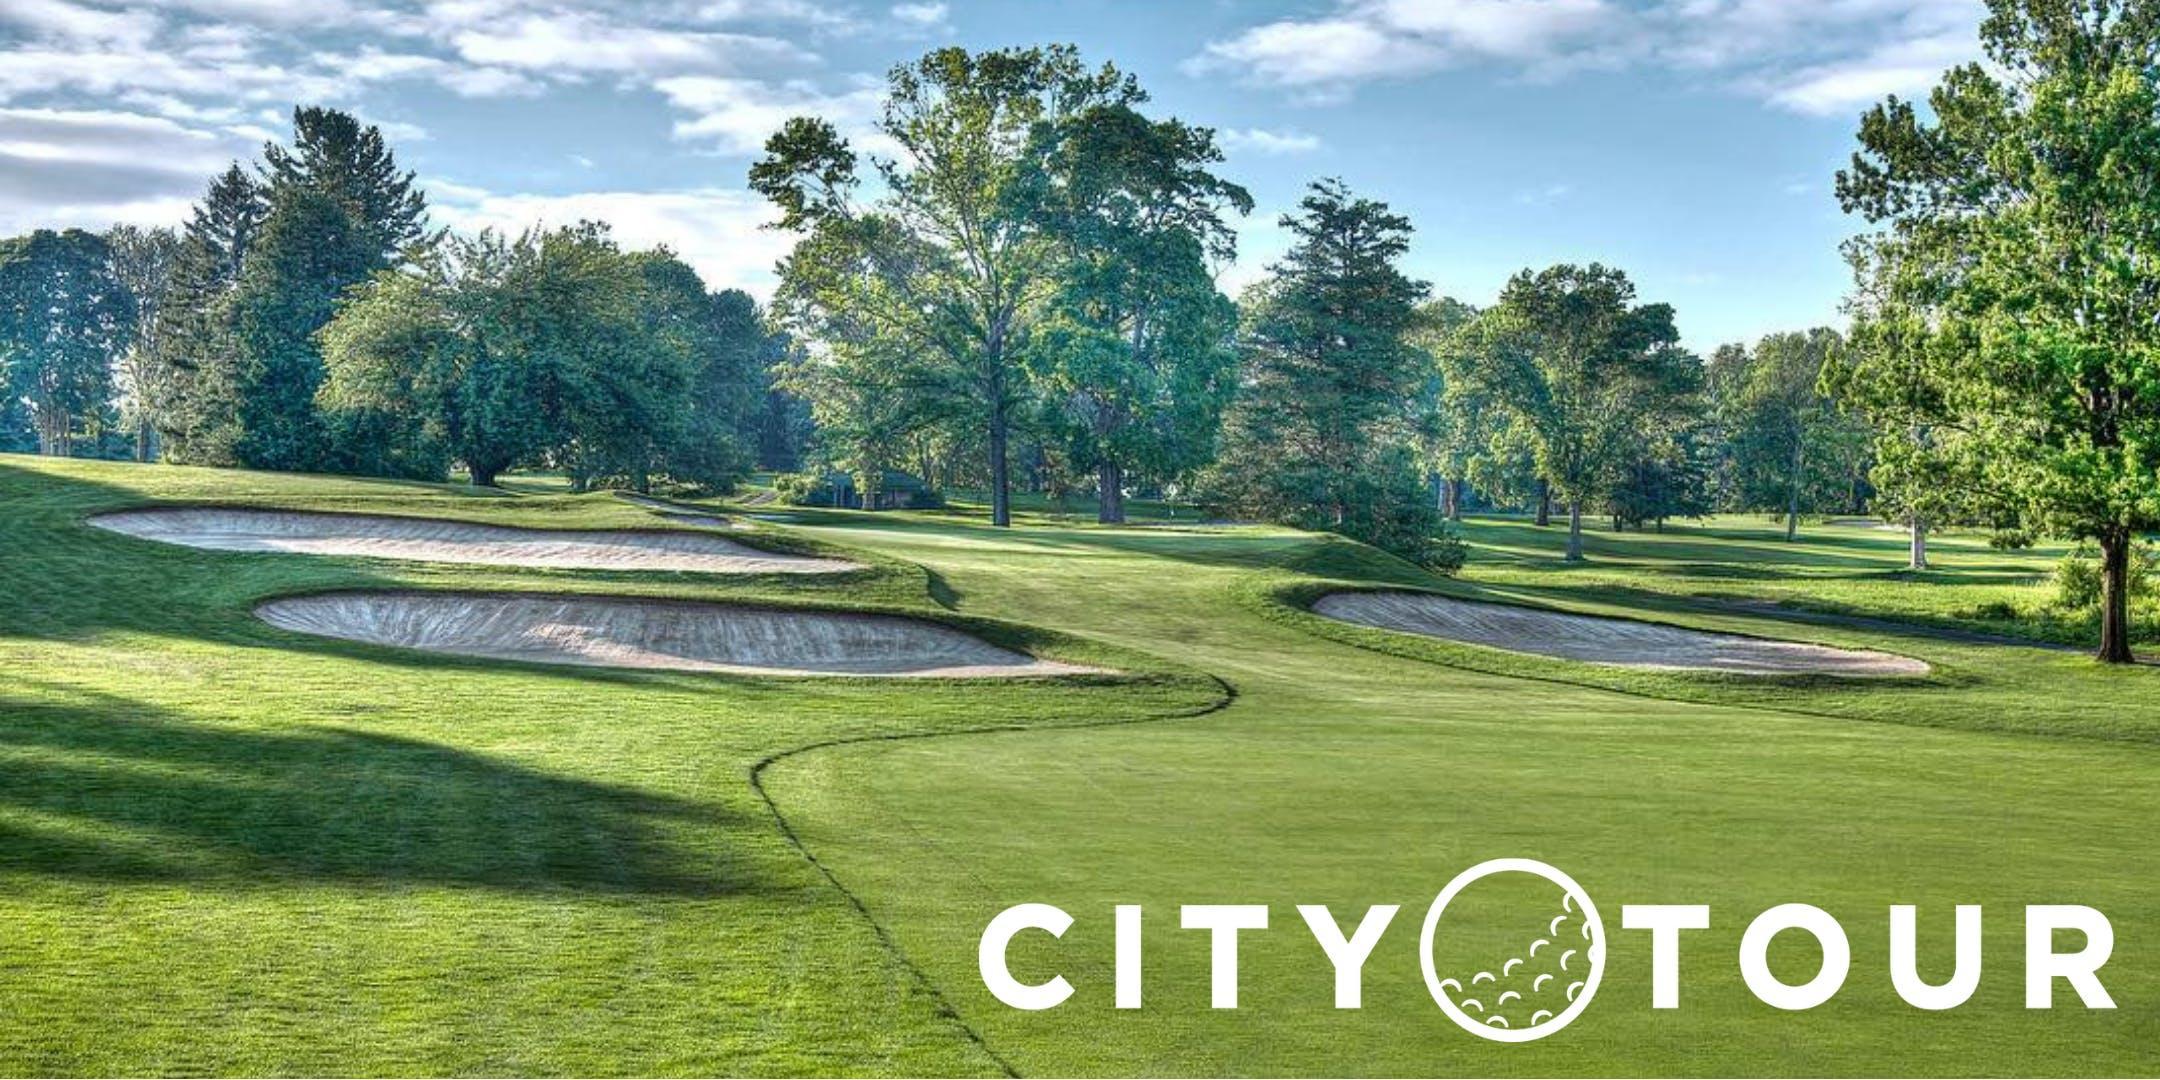 New Orleans City Tour - Bayou Oaks - South Course